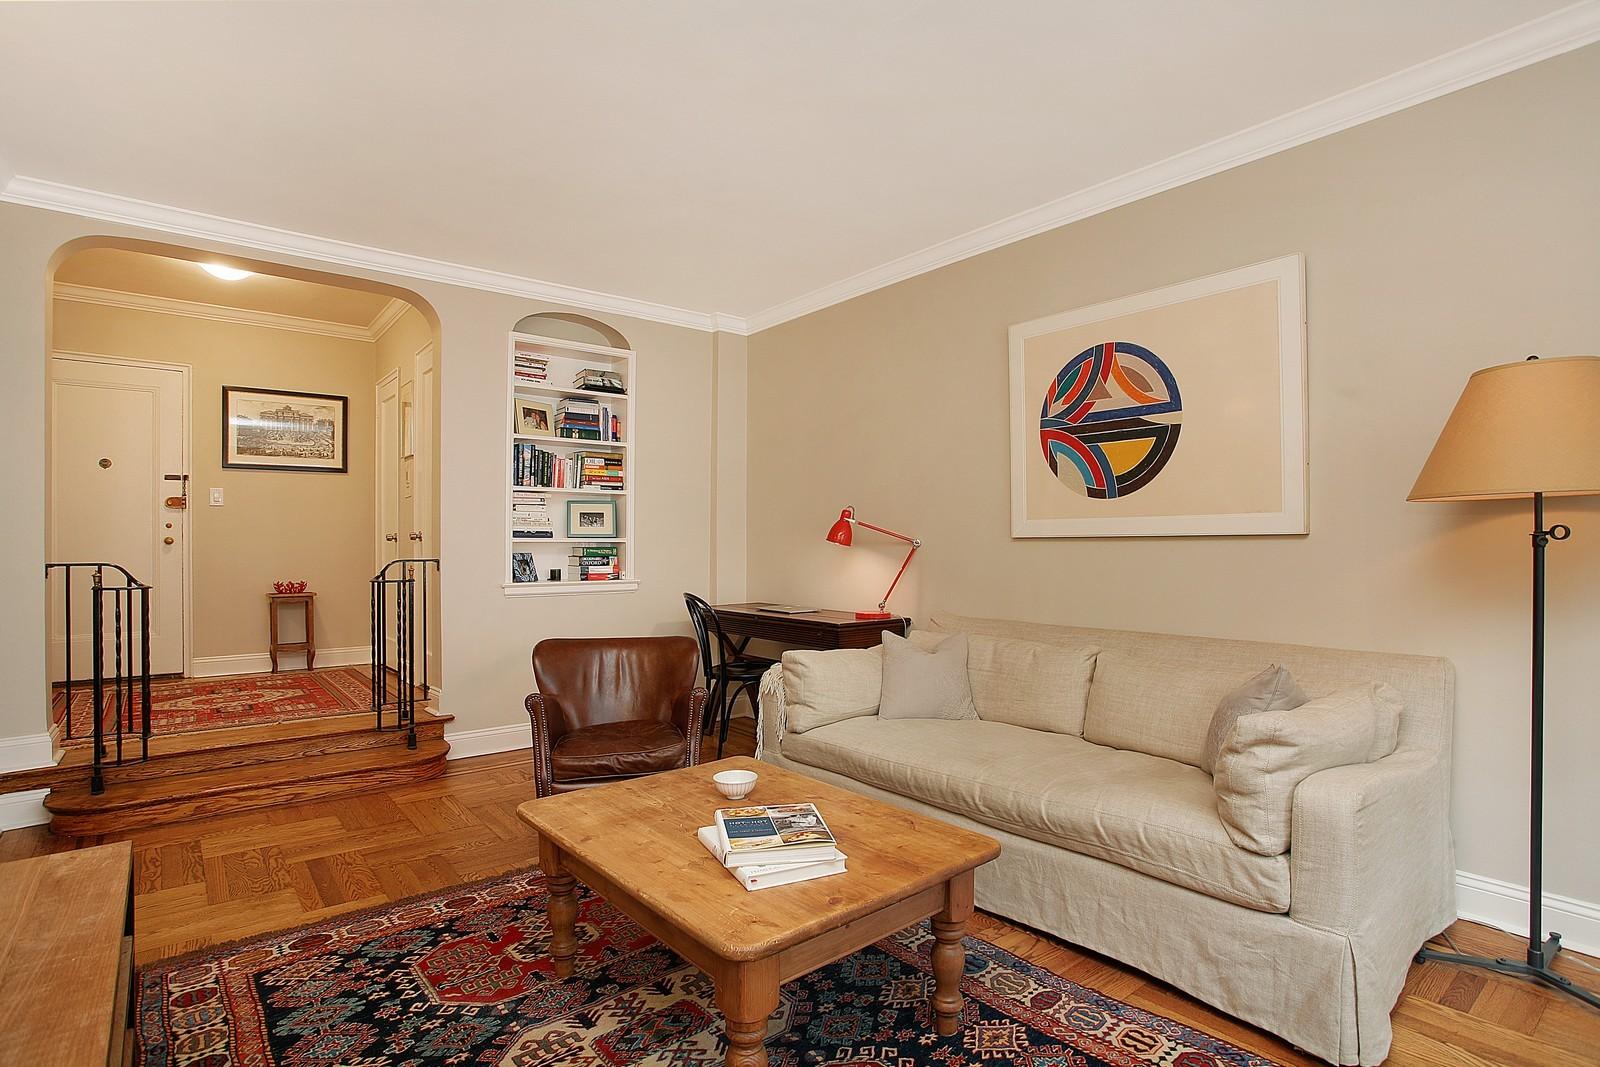 Corcoran, 25 Minetta Lane, Apt. 2D, Greenwich Village Real Estate ...